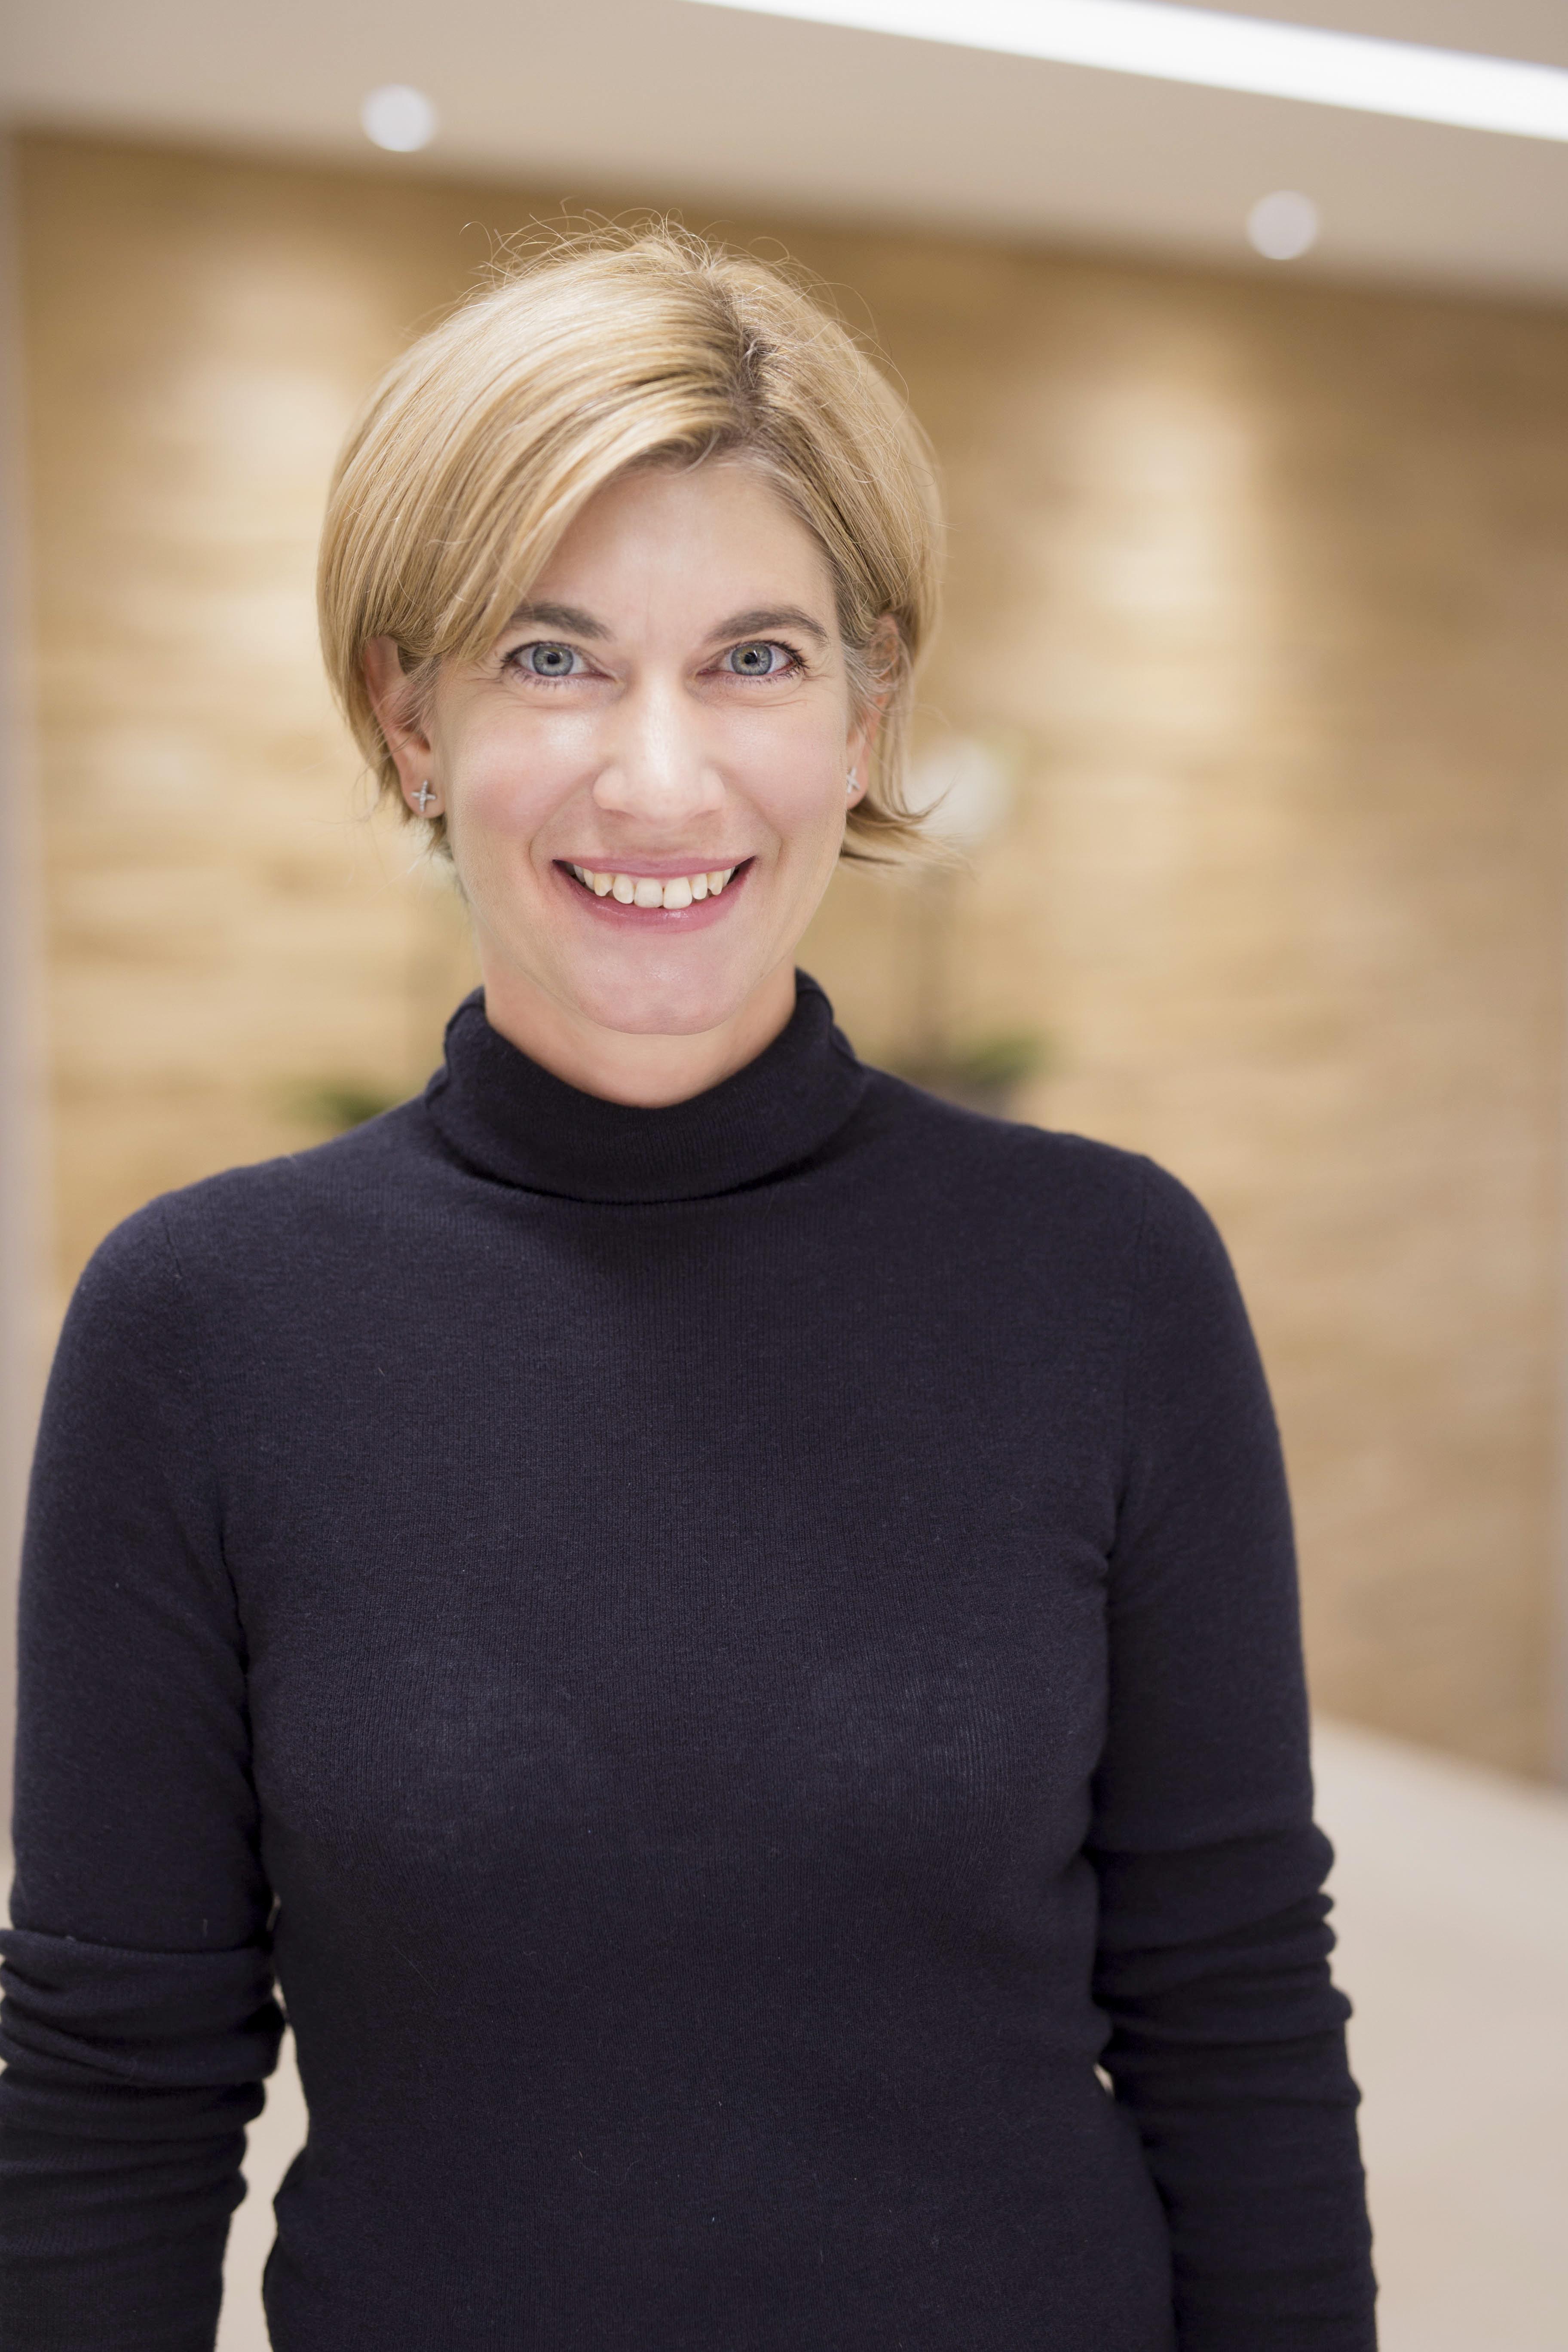 Martina Rüegg